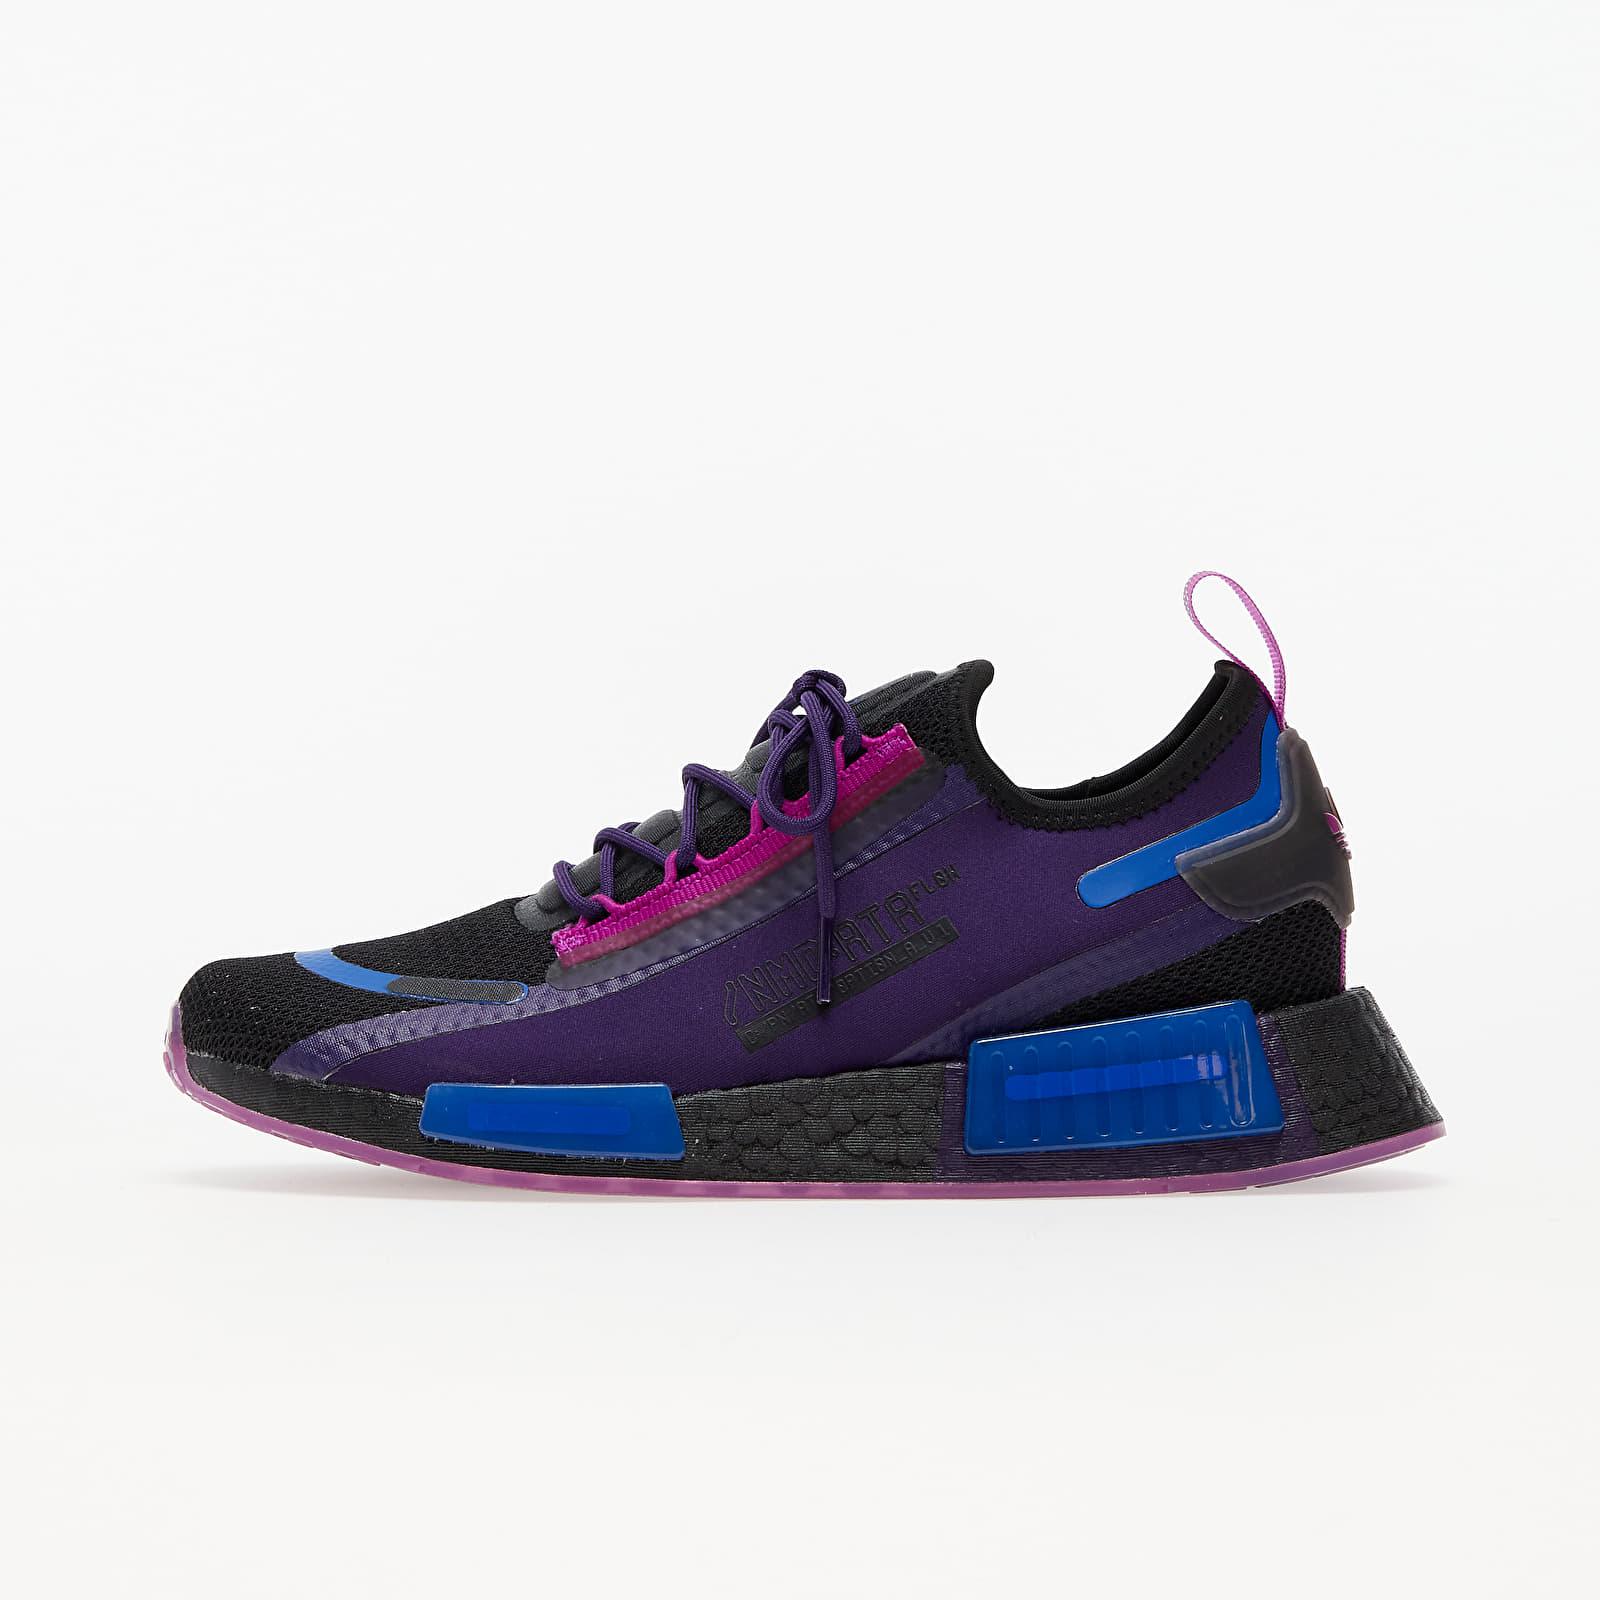 adidas NMD_R1 Spectoo W Core Black/ Dark Purple/ Bold Blue EUR 40